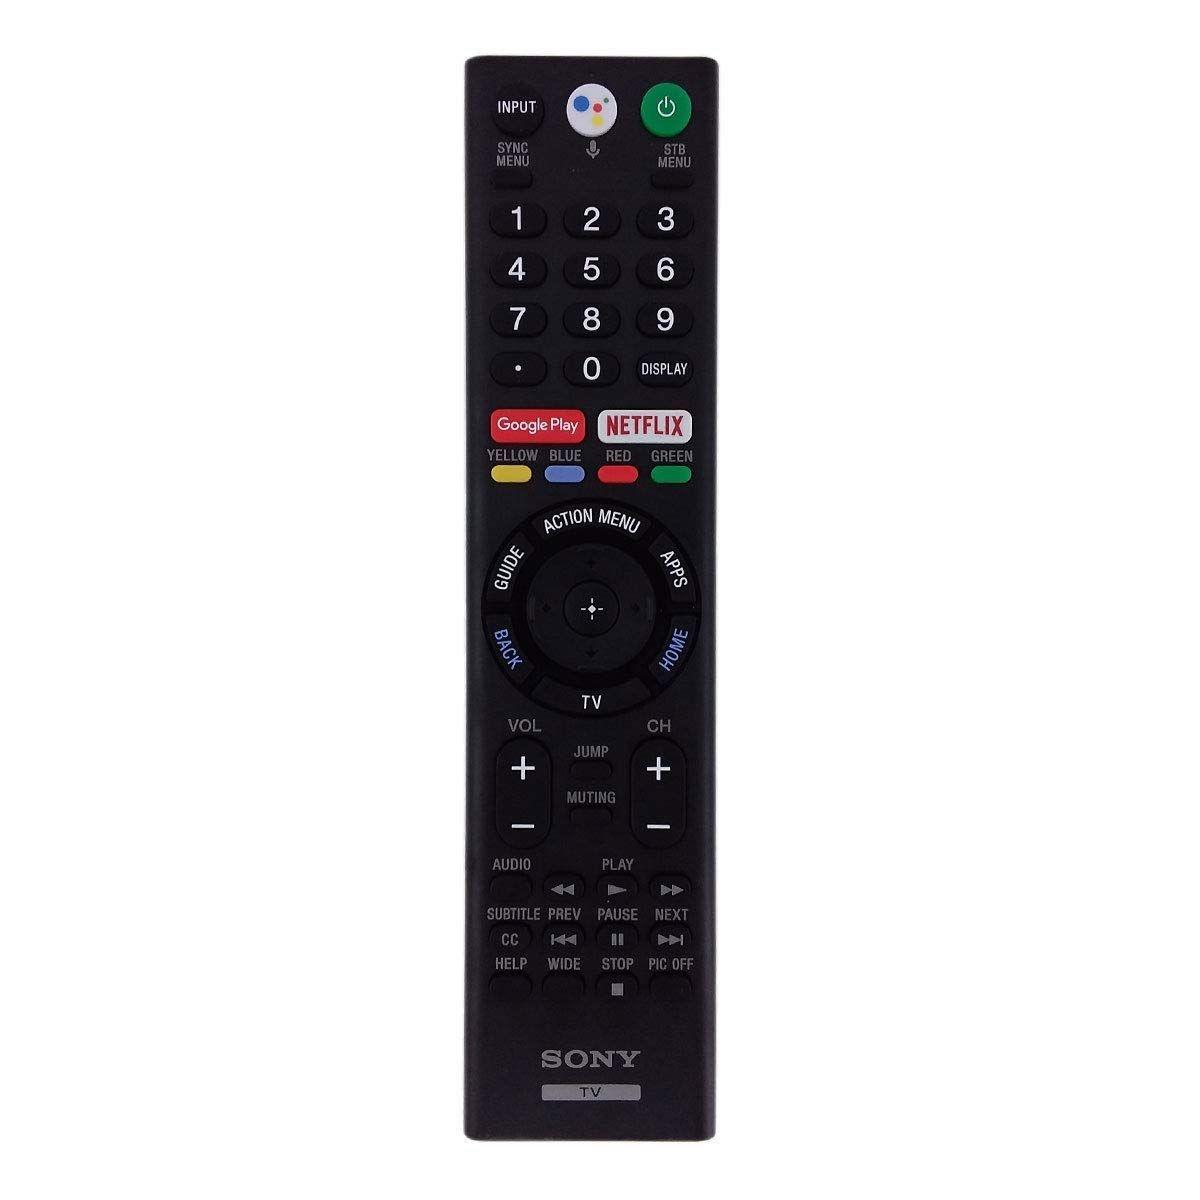 Sony TV Remote Control for Sony XBR-55X850F / XBR-65X850F Smart TVs - RMF-TX310U